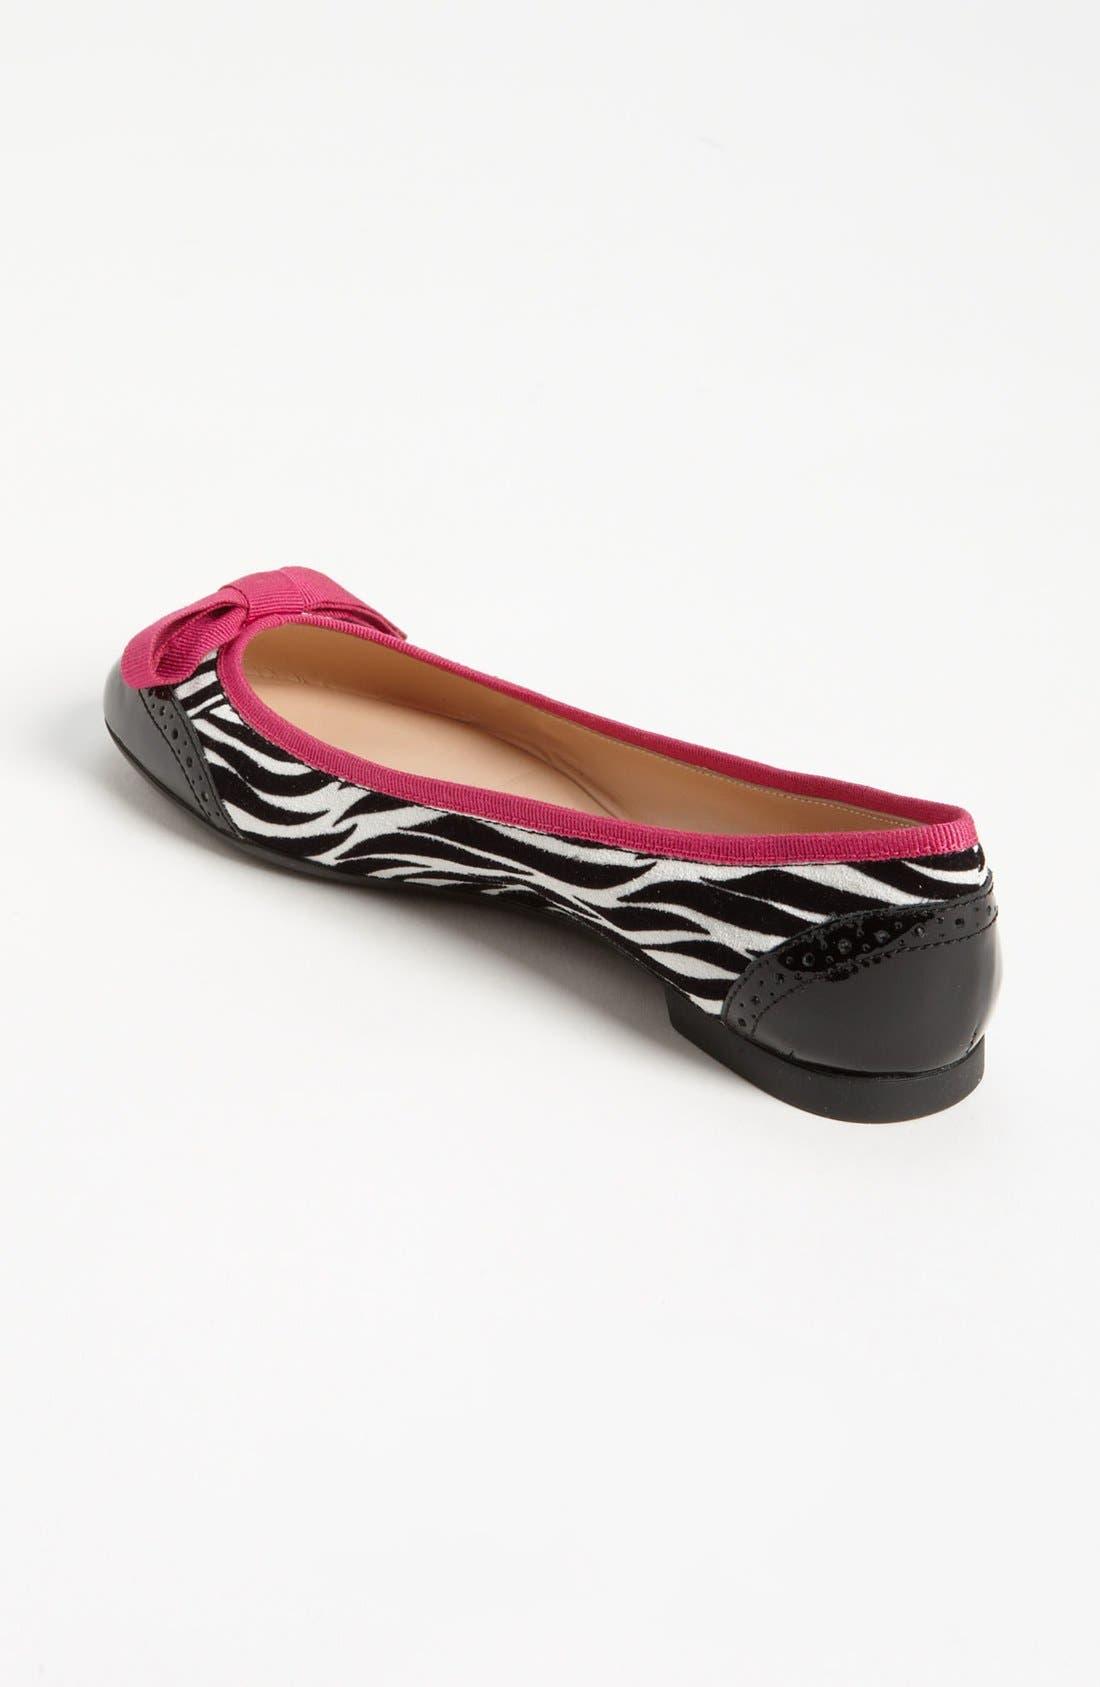 Alternate Image 2  - Sweet Ballerina 'Biancospino' Zebra Print Ballet Flat